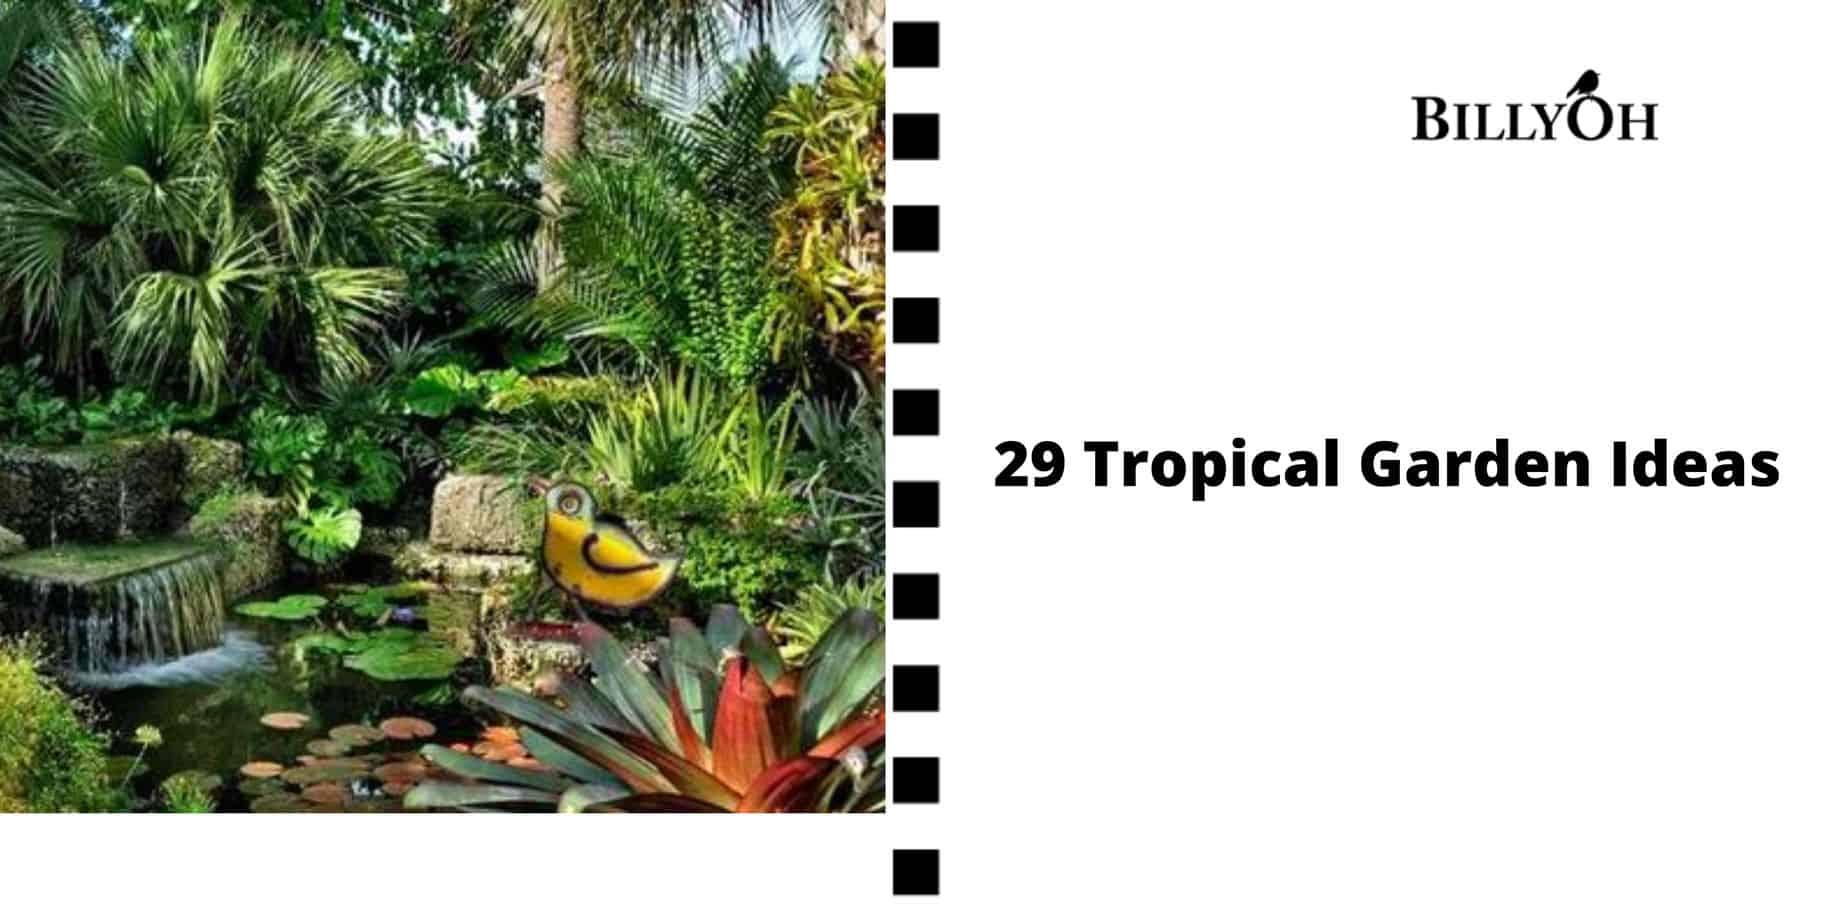 29 Tropical Garden Ideas BillyOh